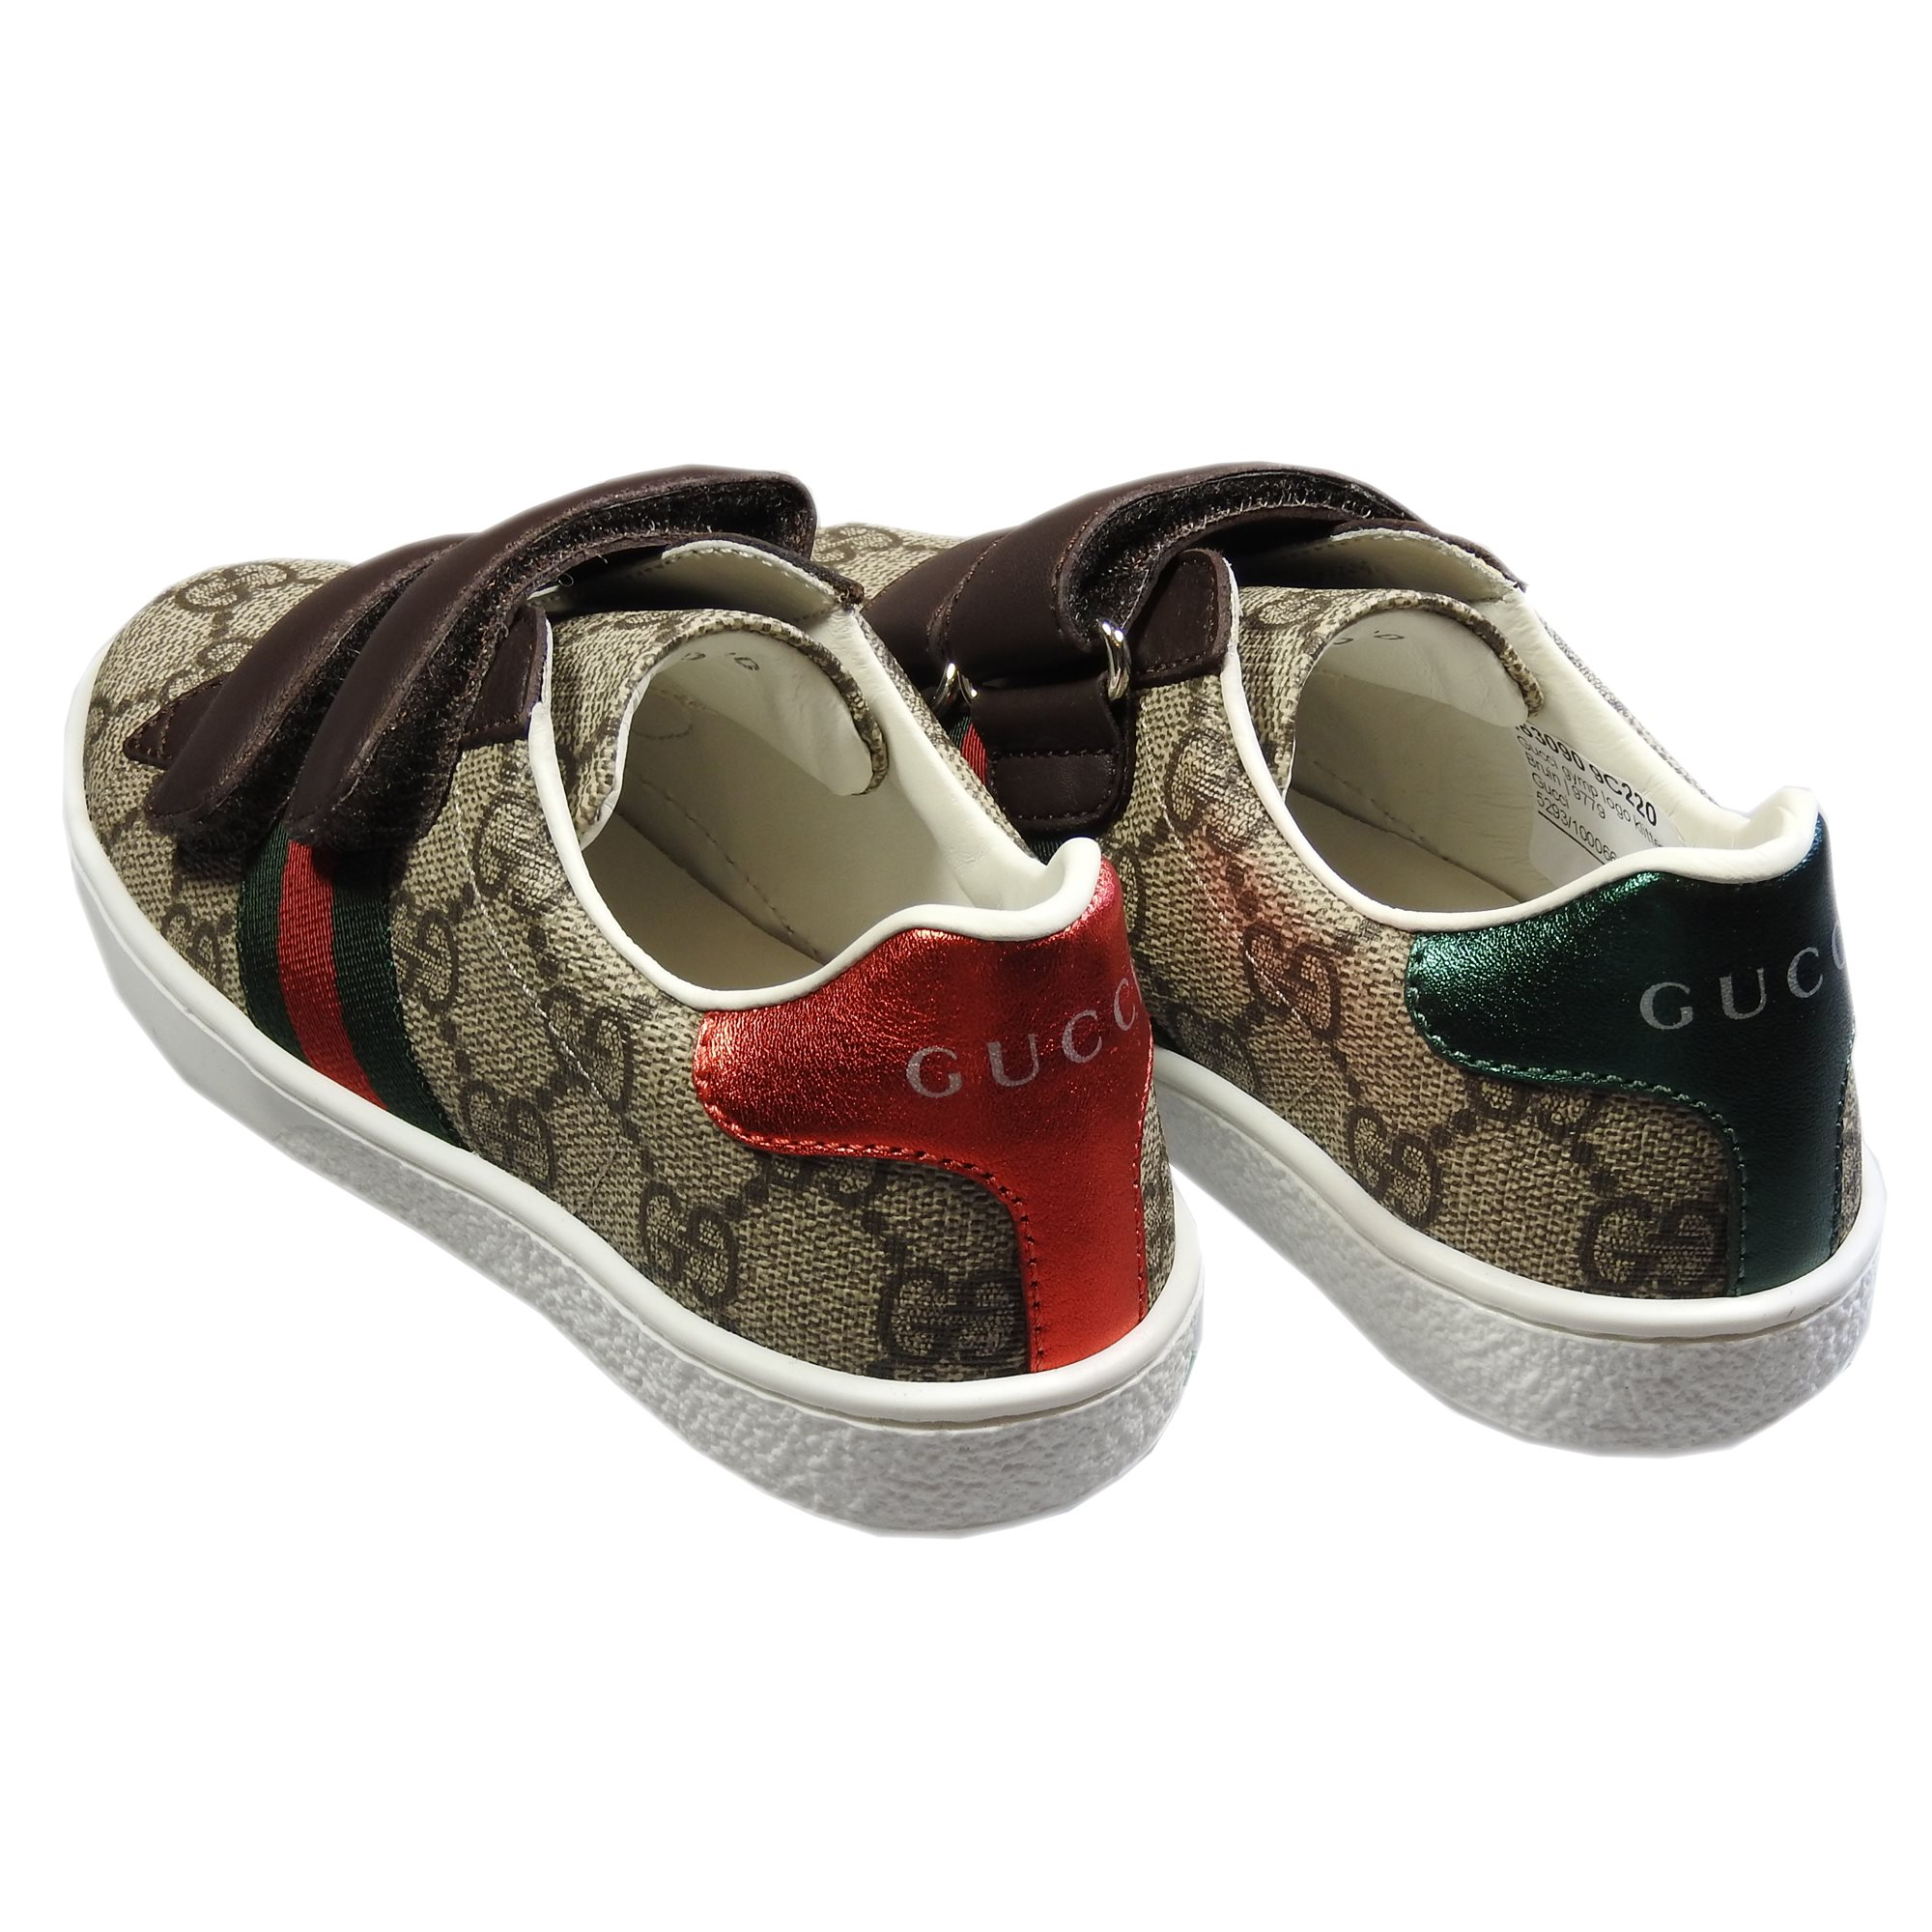 509472ad7f9 Producten - Gucci gymp logo klittenband - La Boite - Kids fashion ...